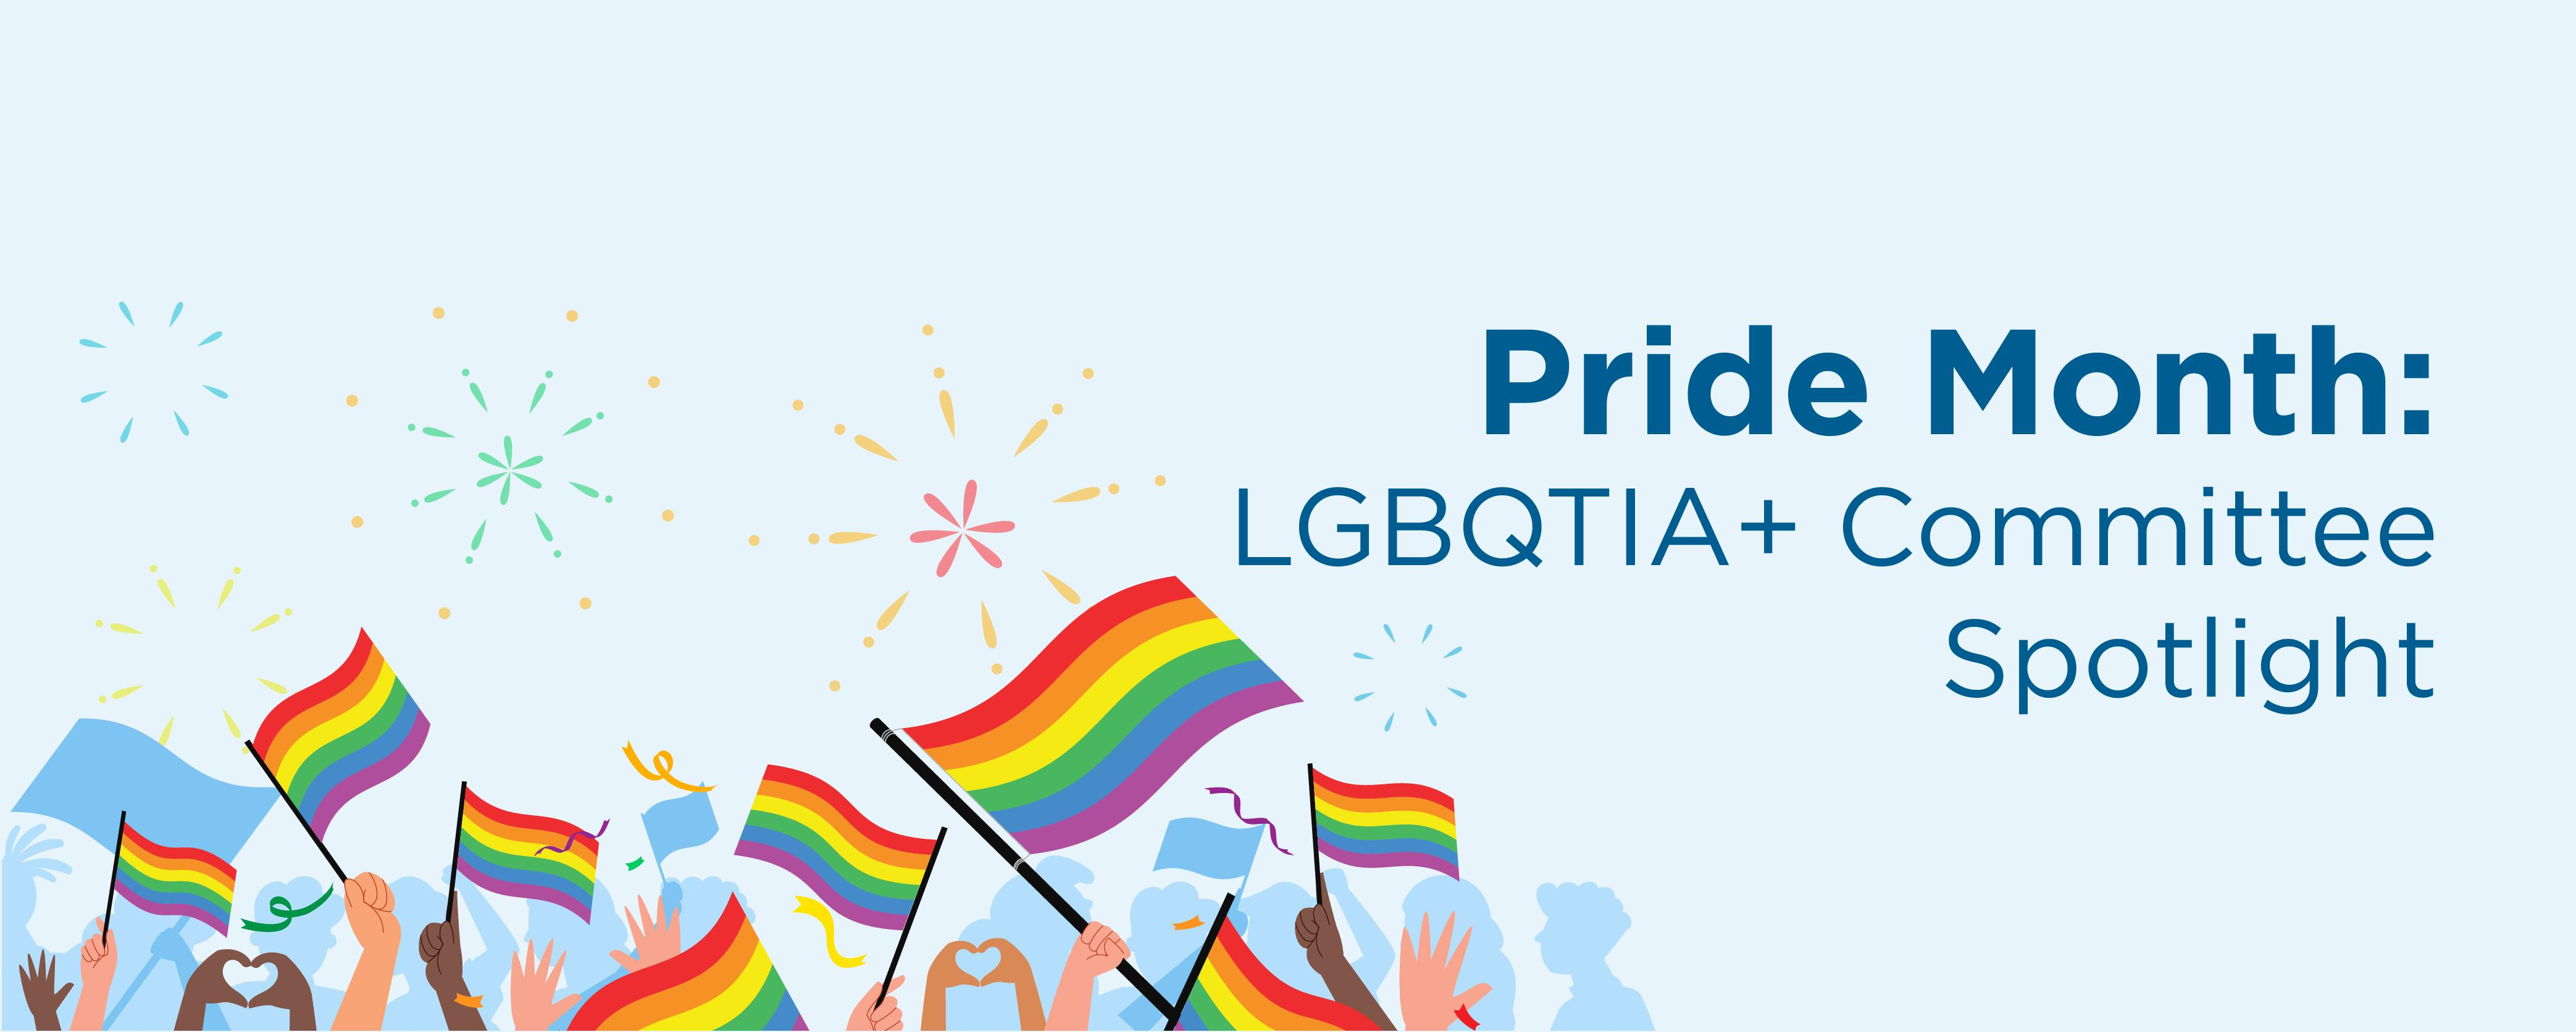 Pride Month: LGBQT+ Committee Spotlight